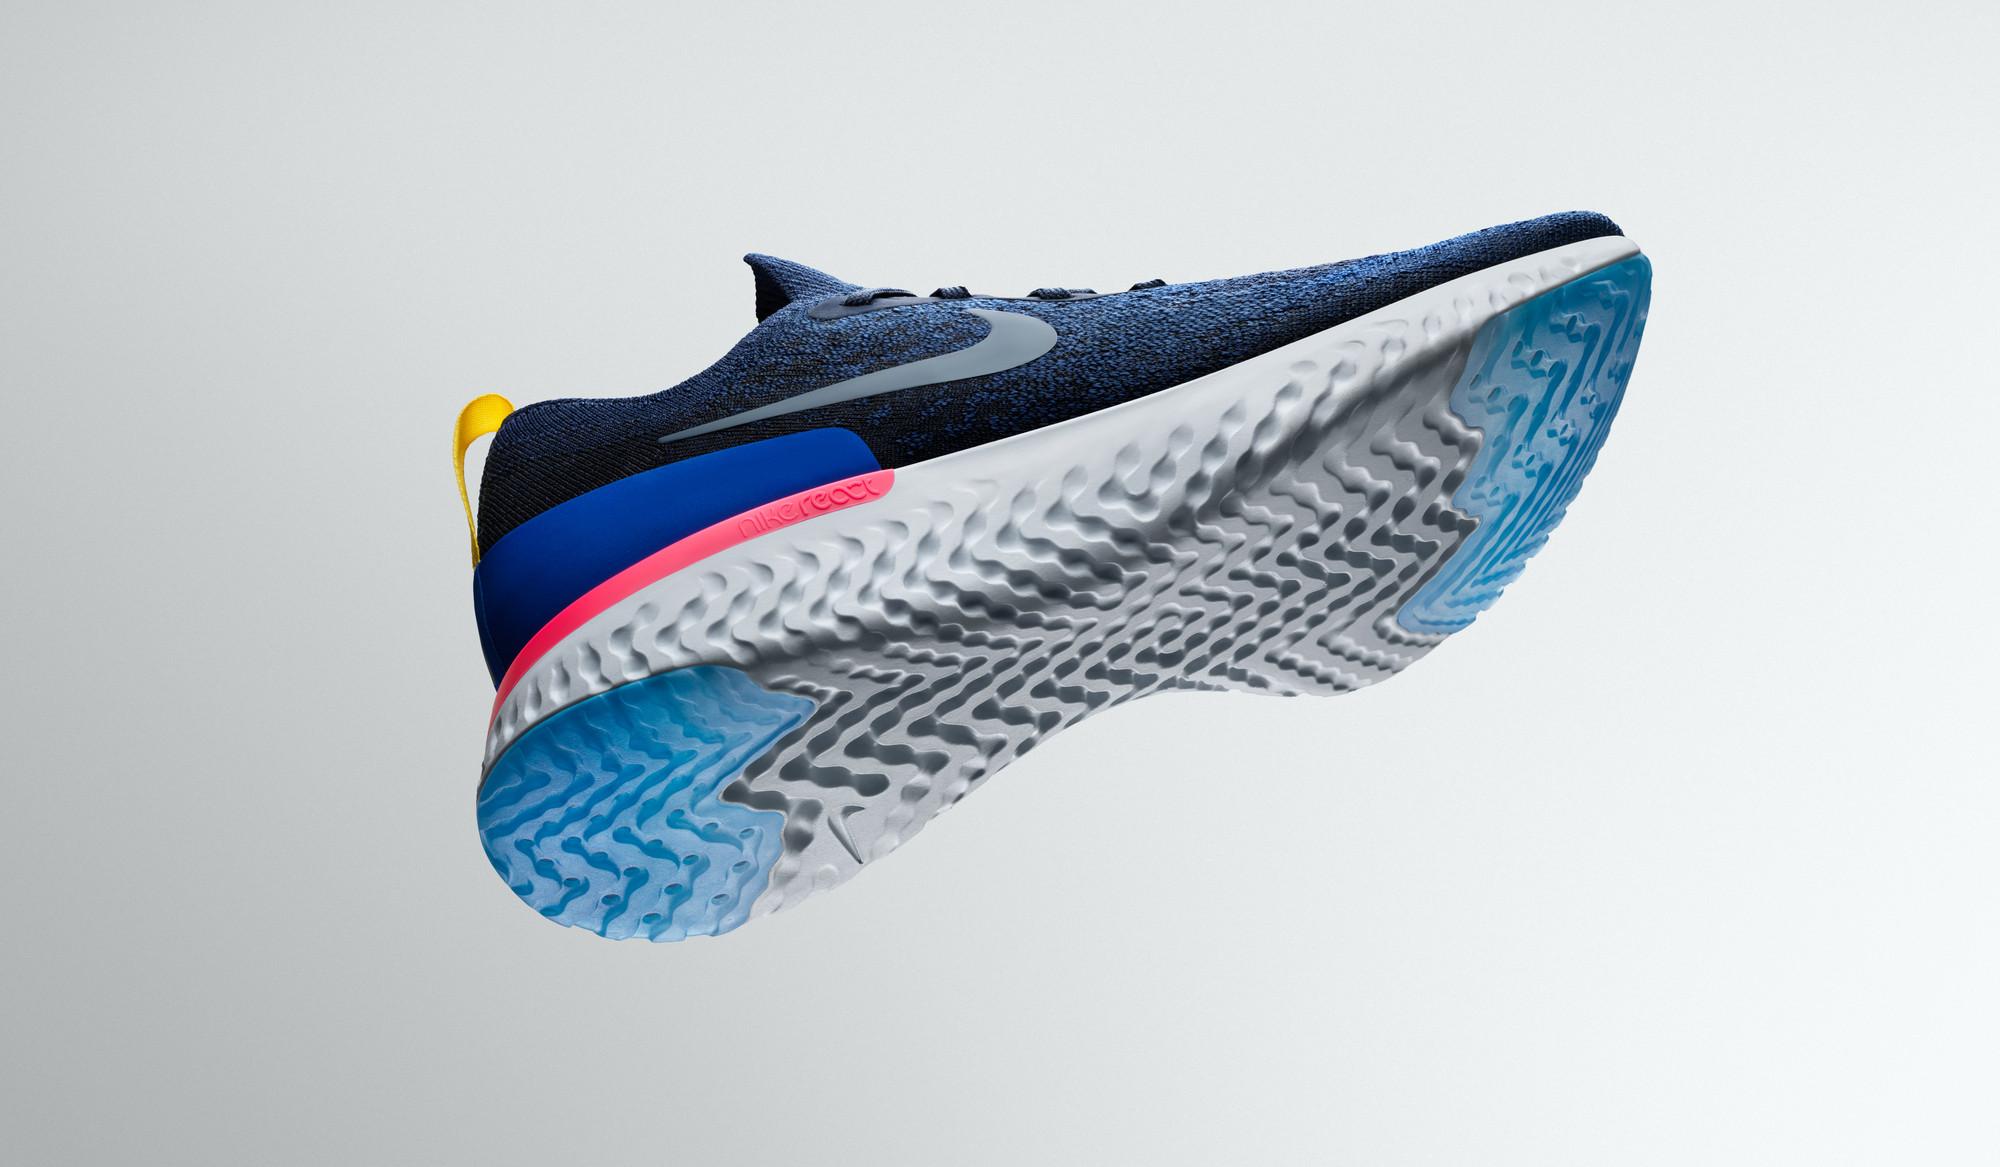 RunningLa Sa De Nike Chaussure React Epic Présente Nouvelle YyvI6fb7g